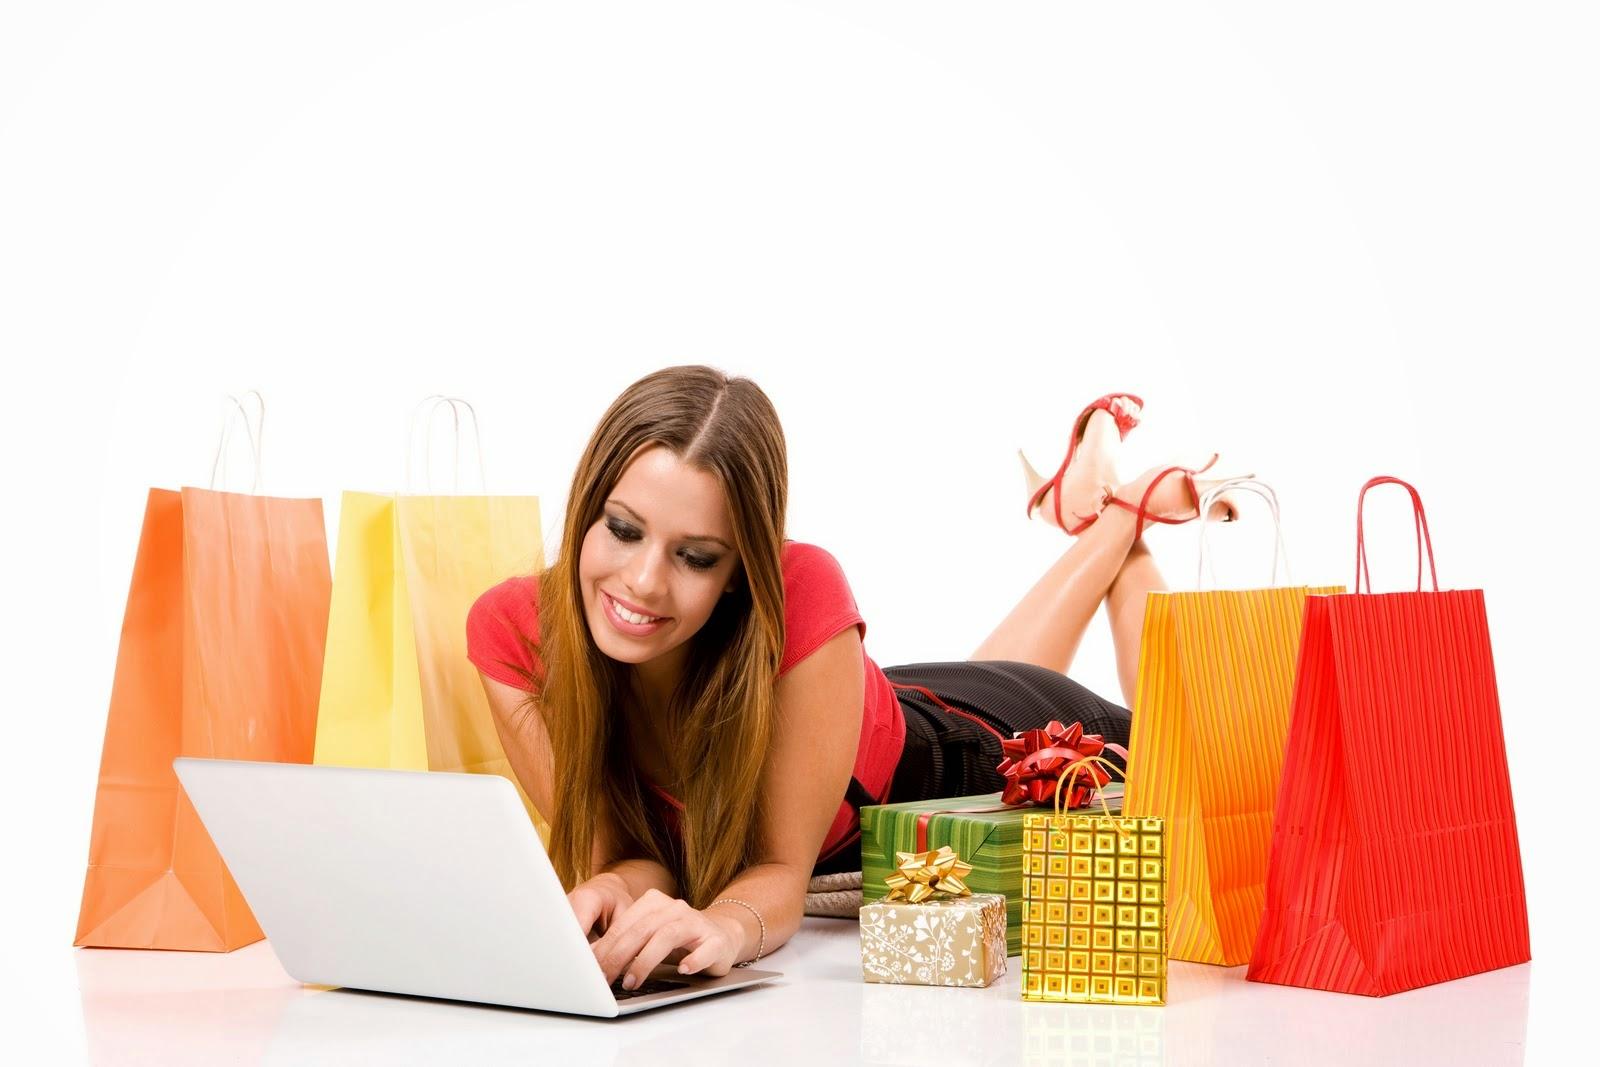 compras na internet